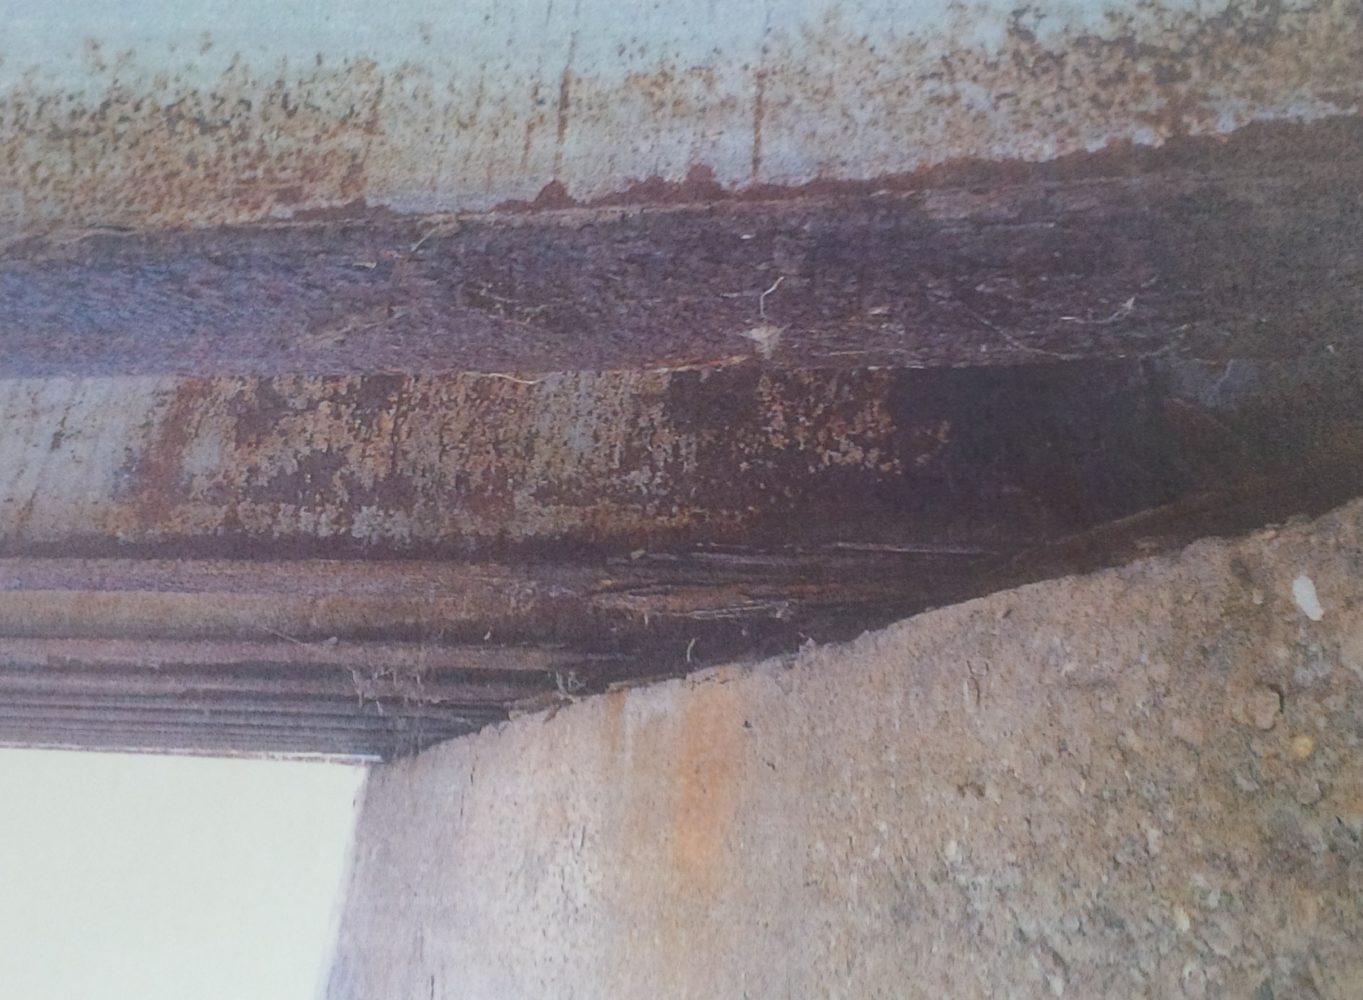 Weight Limit Reduced on Carrollton City Bridge